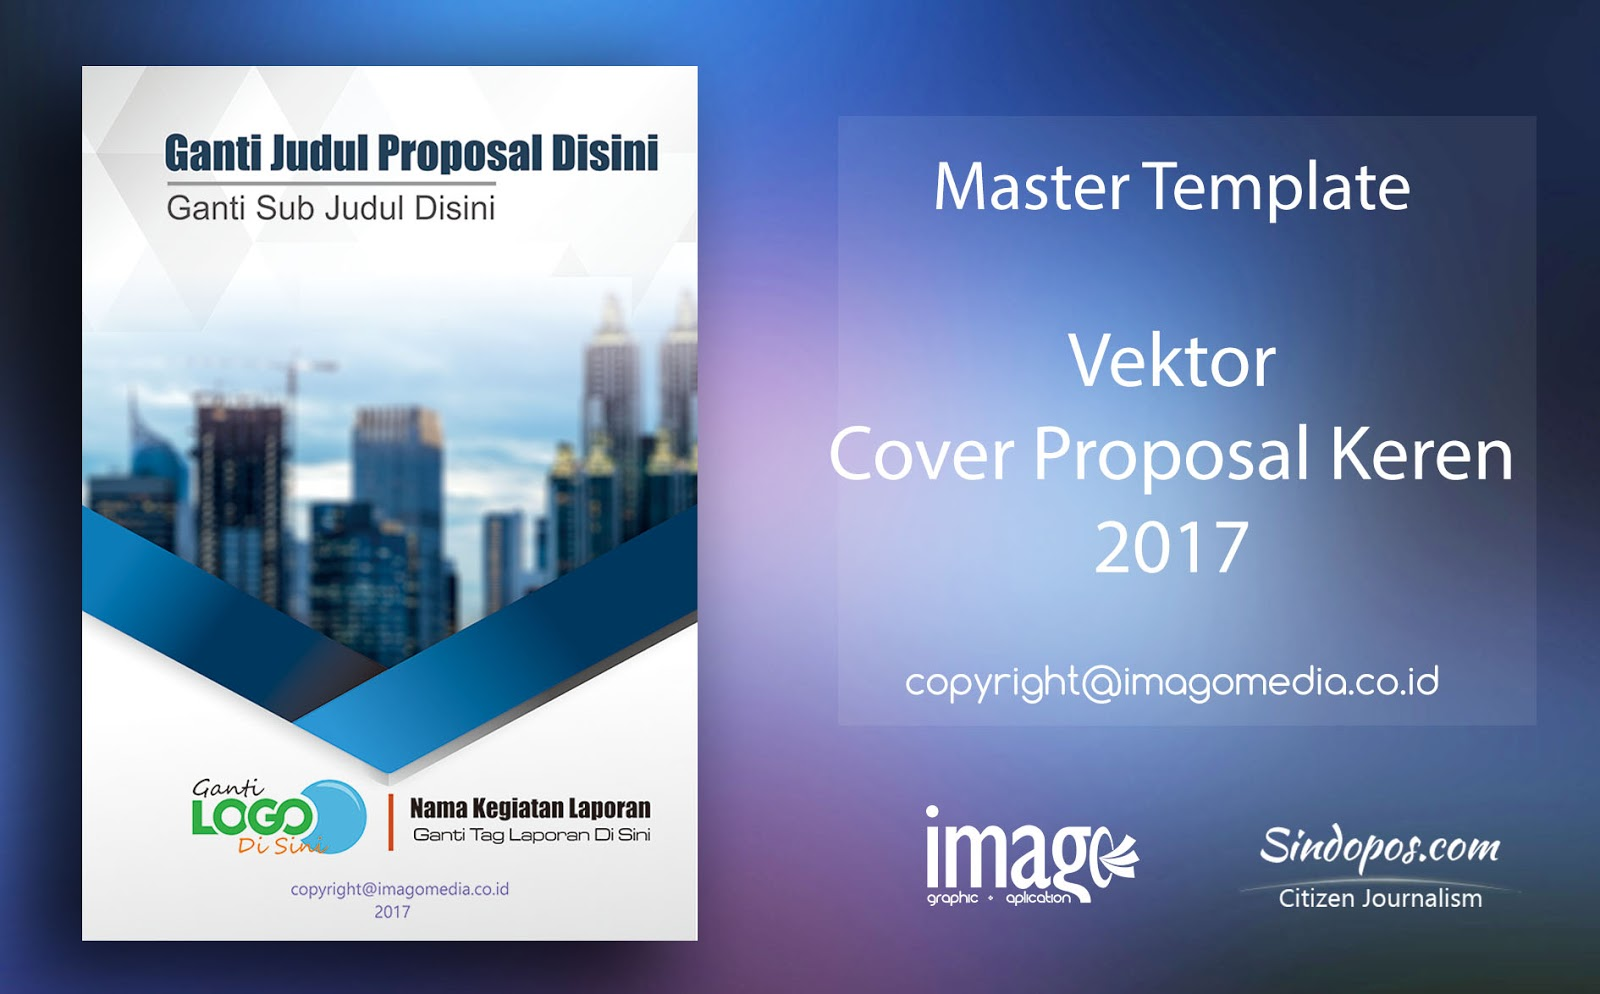 Download Template Desain Cover Proposal Keren 2017 Imago